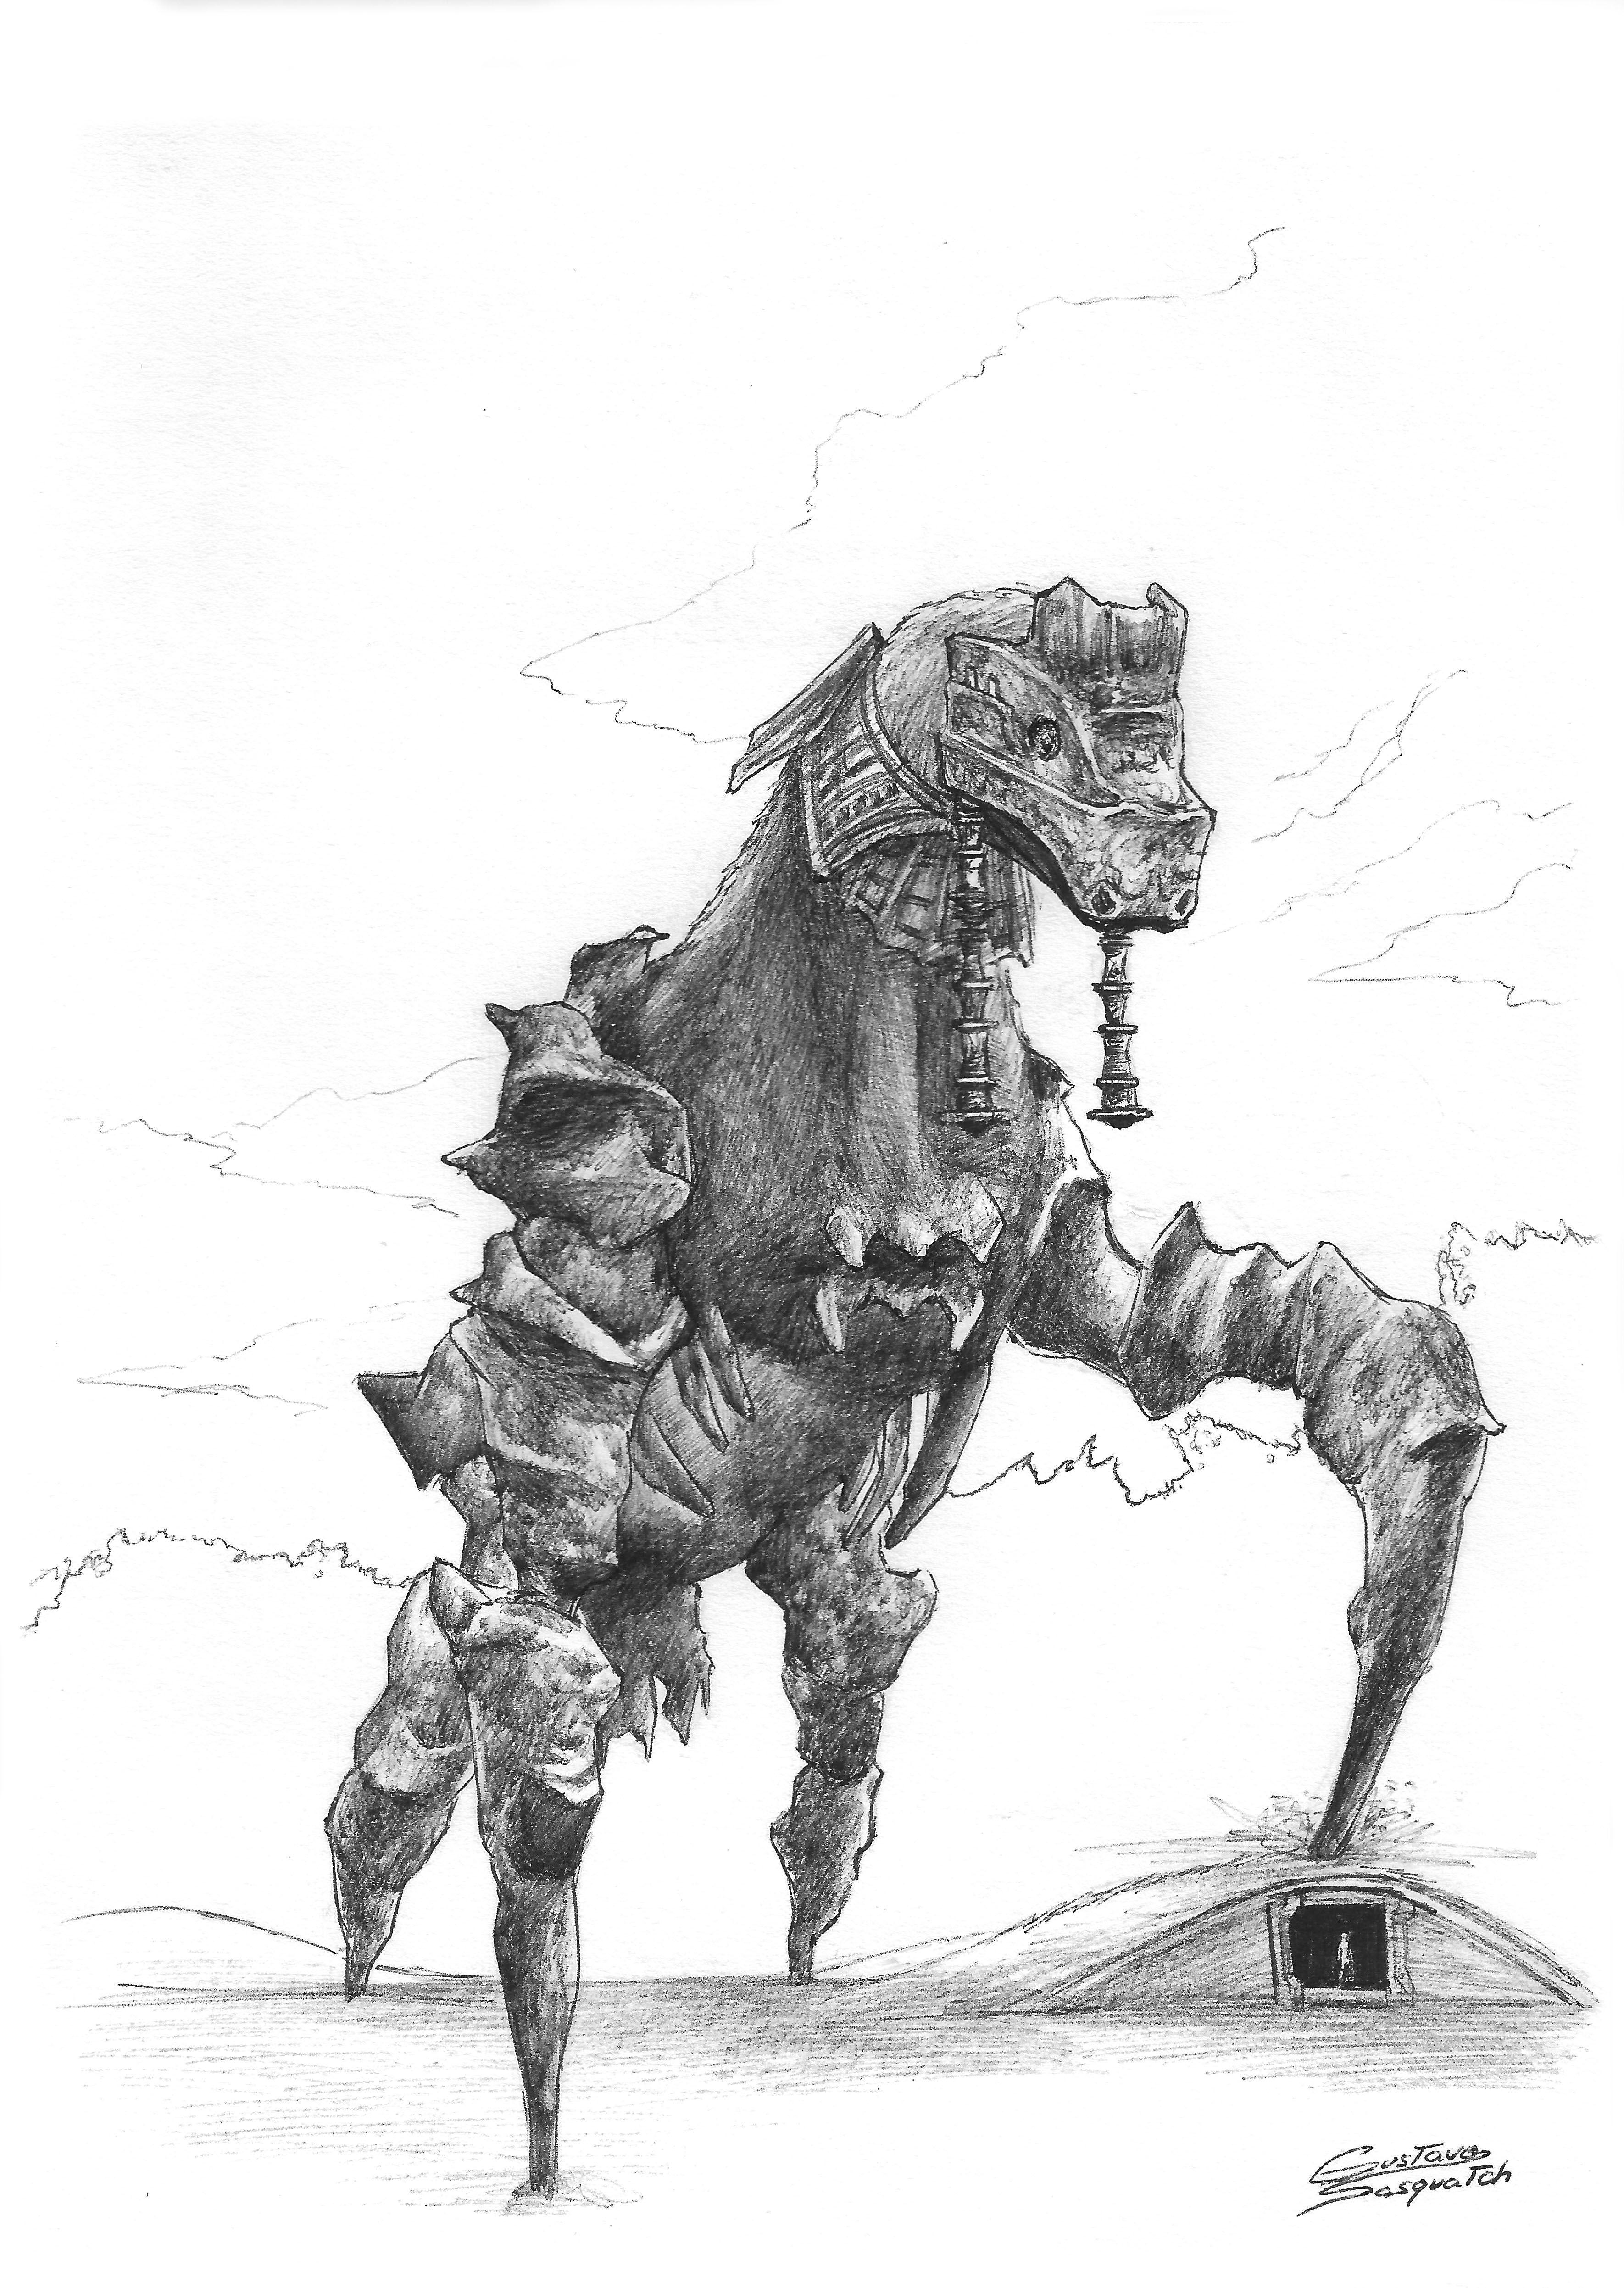 Phaedra Shadowofthecolossus Sotc Phaedra Teamico Fanart Shadow Of The Colossus Colossus Colossus Game